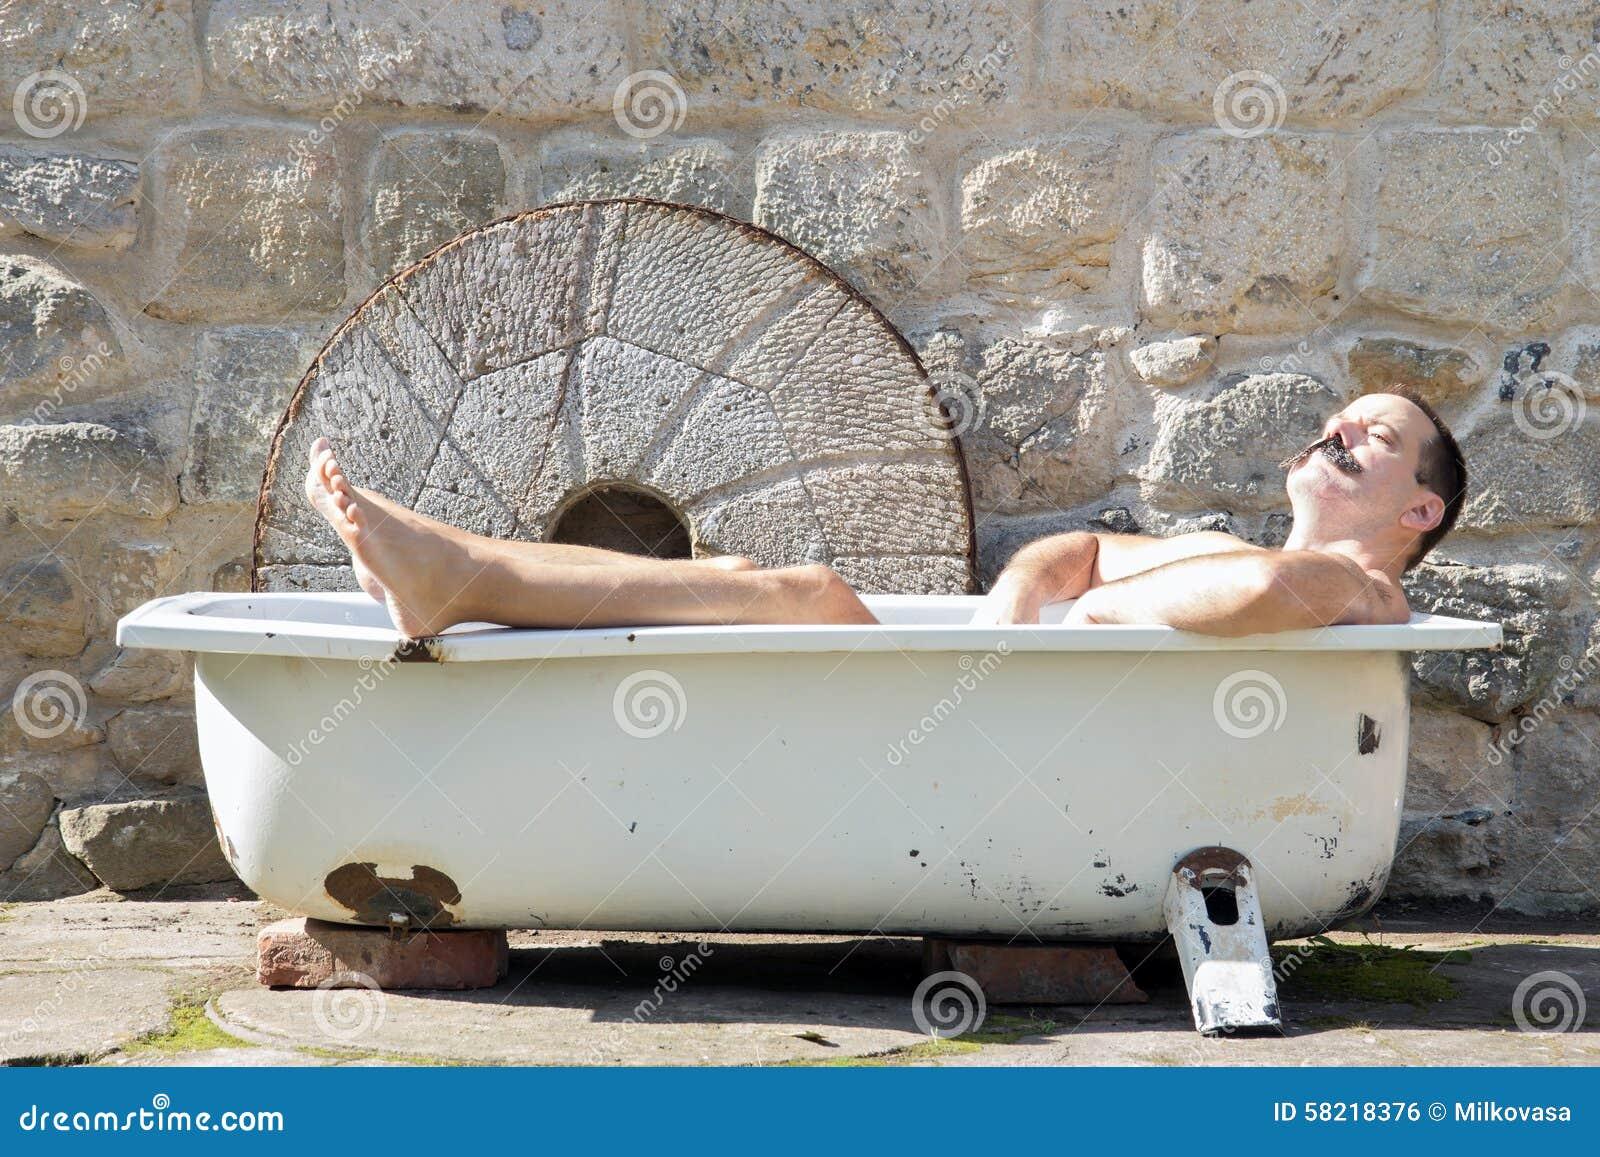 Man Bathtub Stock Photos - Royalty Free Pictures